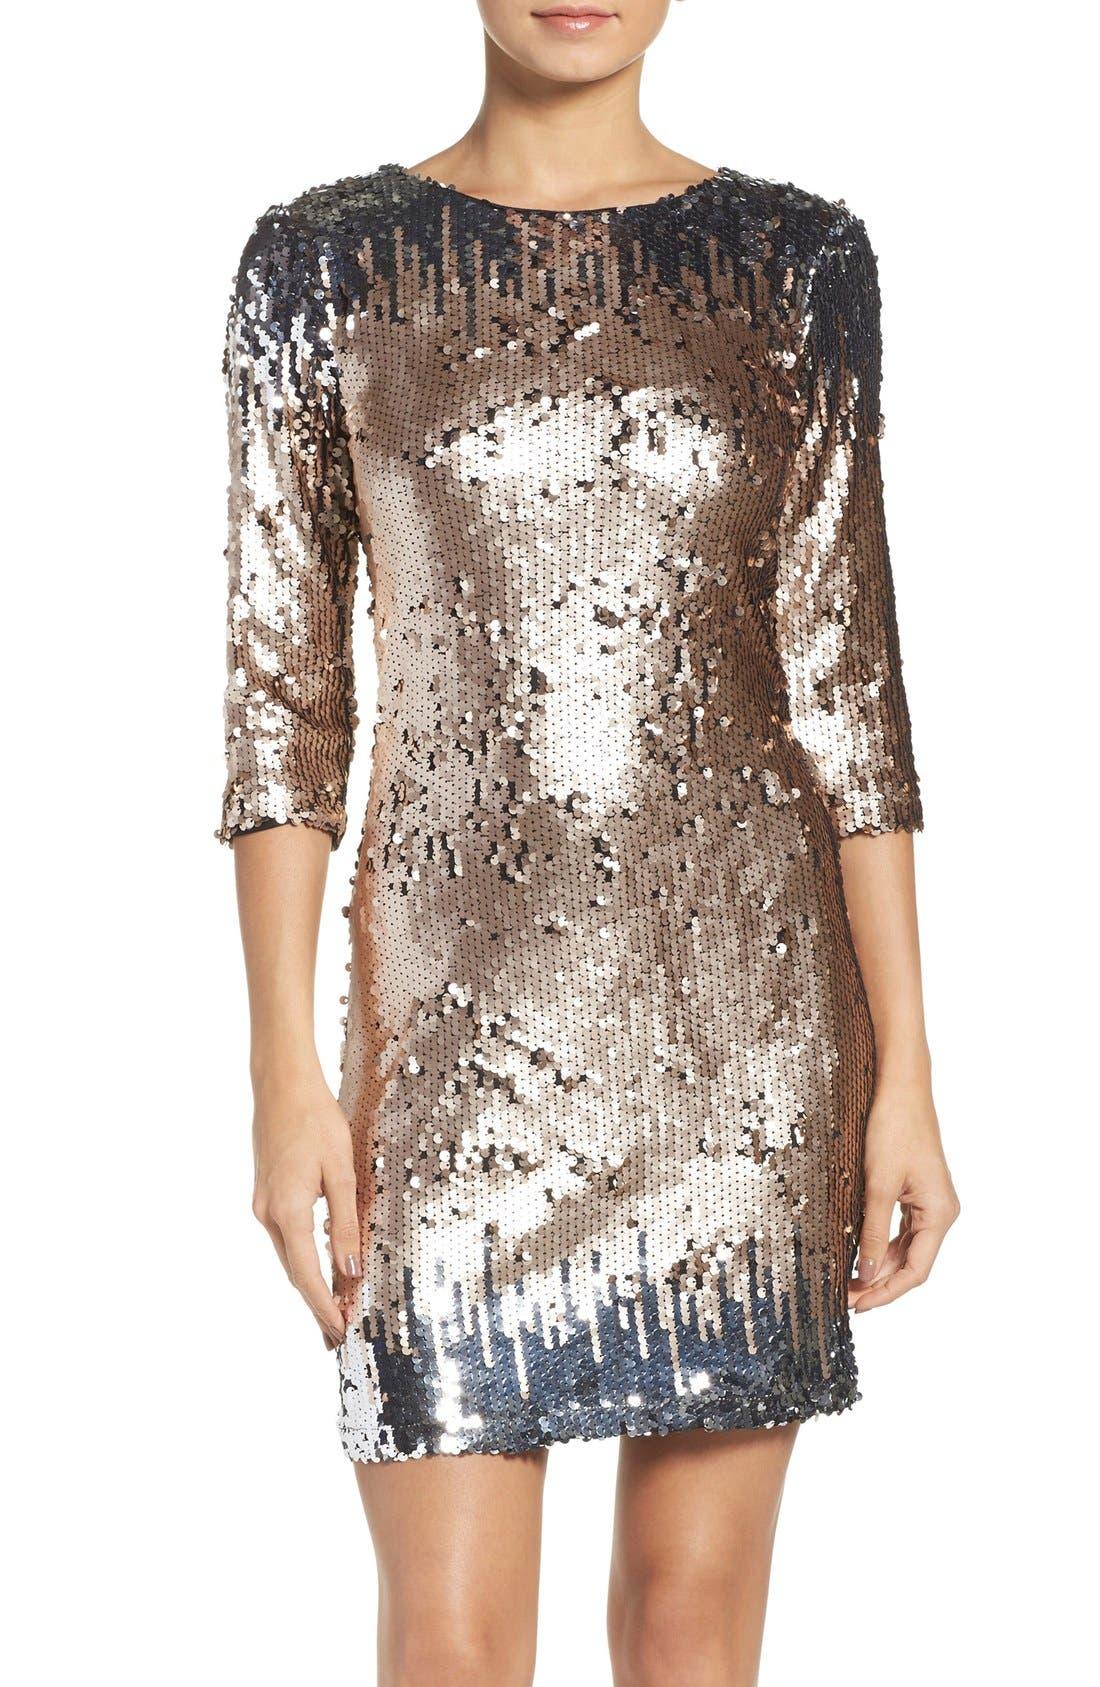 Alternate Image 1 Selected - BB Dakota Elise Sequin Body-Con Dress